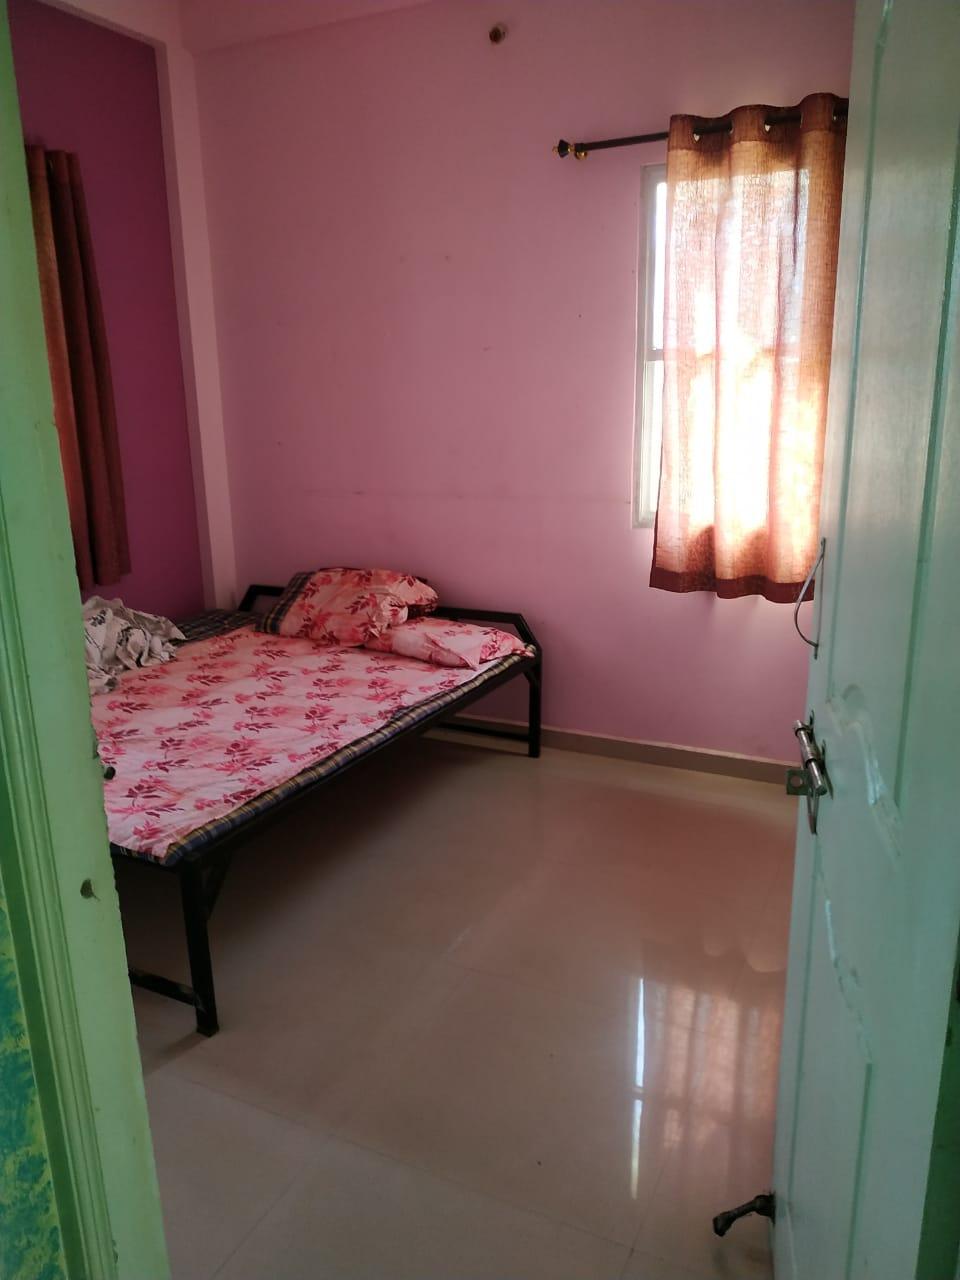 House in Manish Nagar